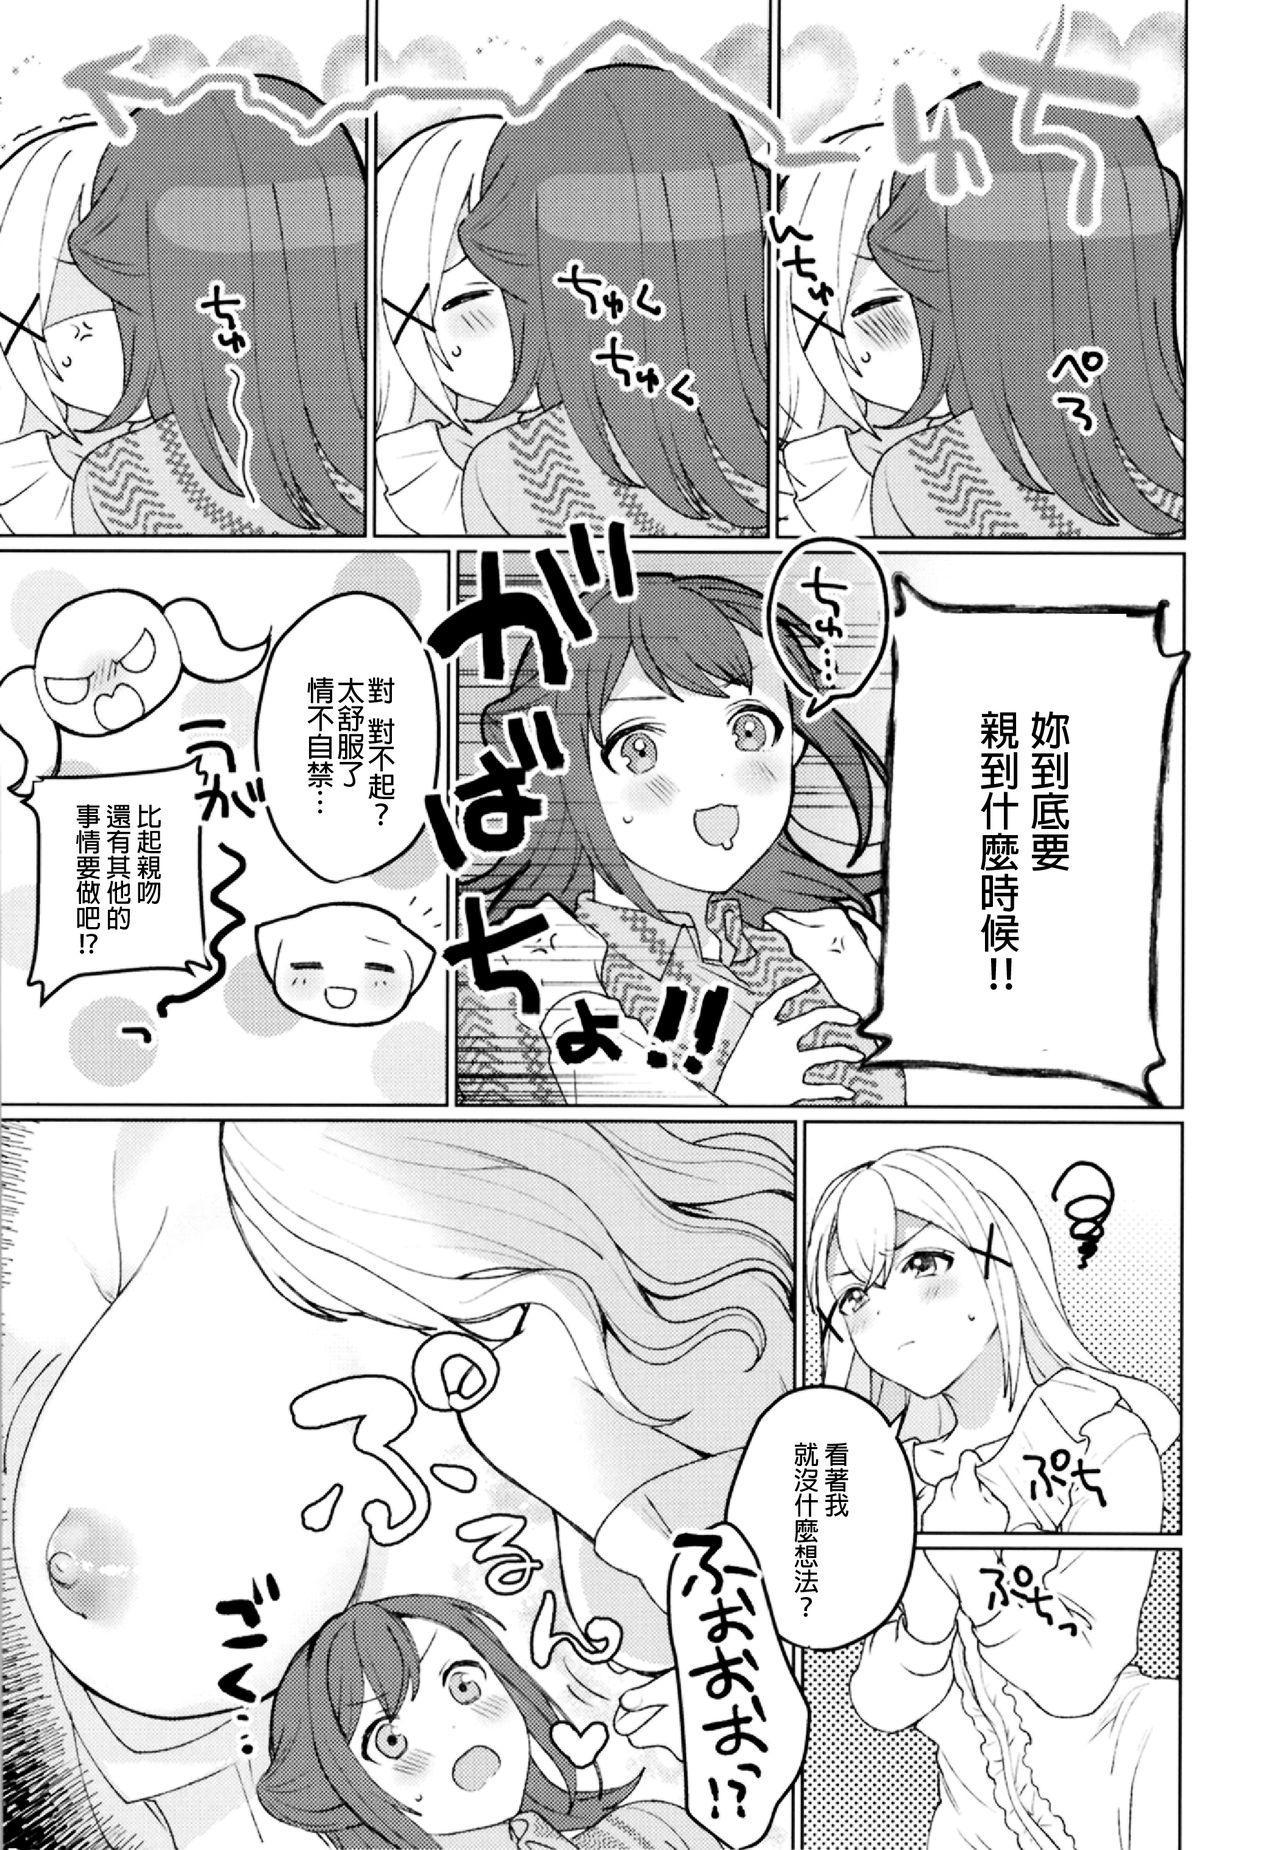 Kimi to Kirakira | 與妳閃閃發光 12